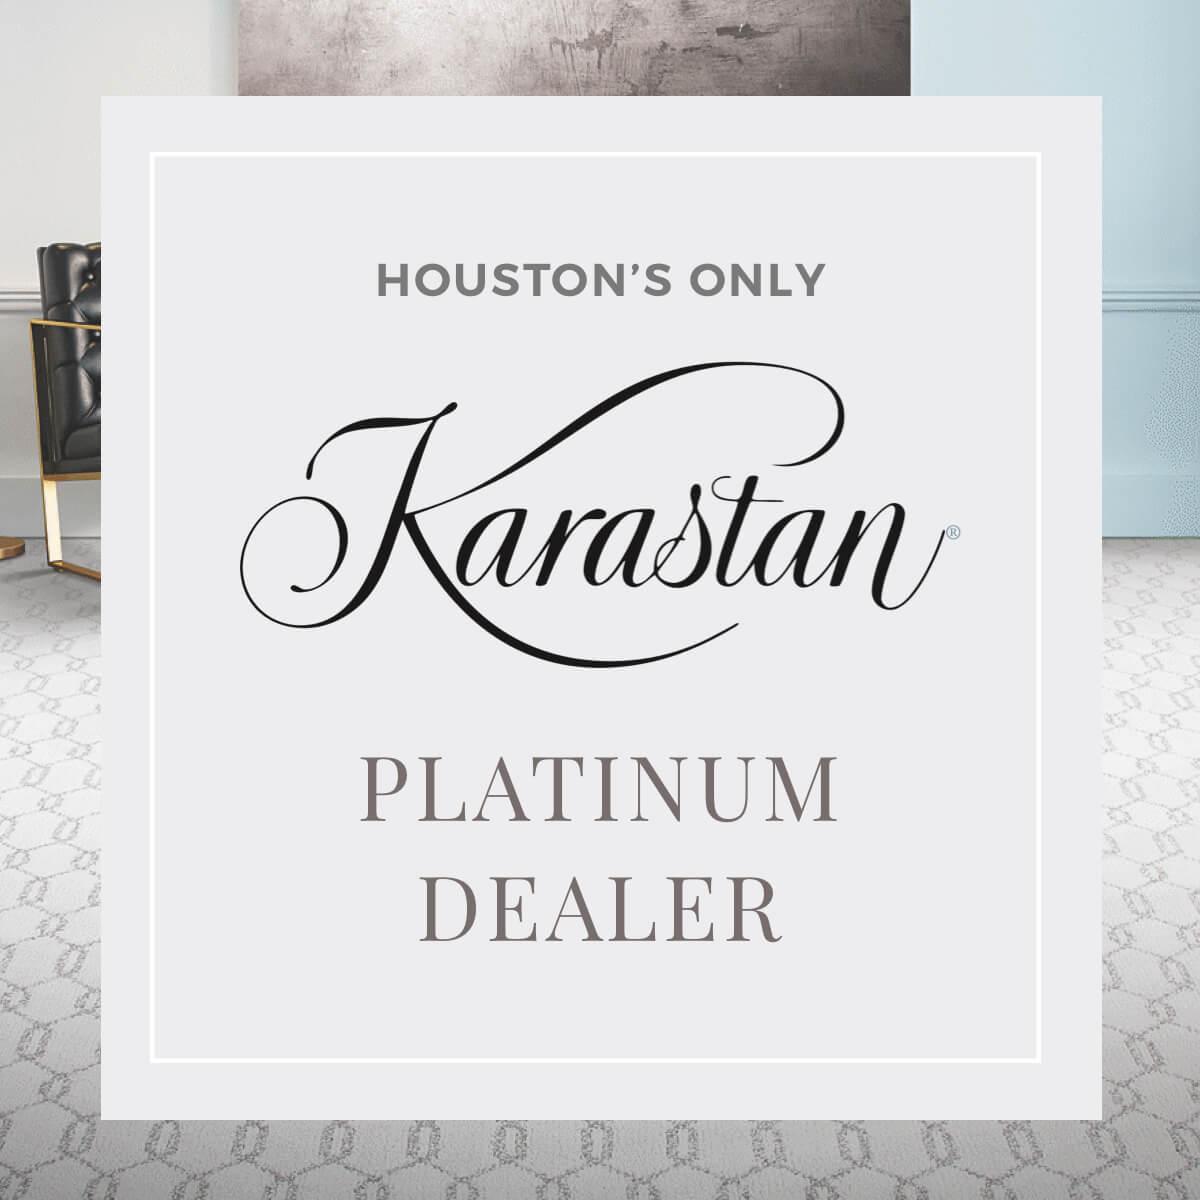 karastan platinum dealer   Roberts Carpet & Fine Floors